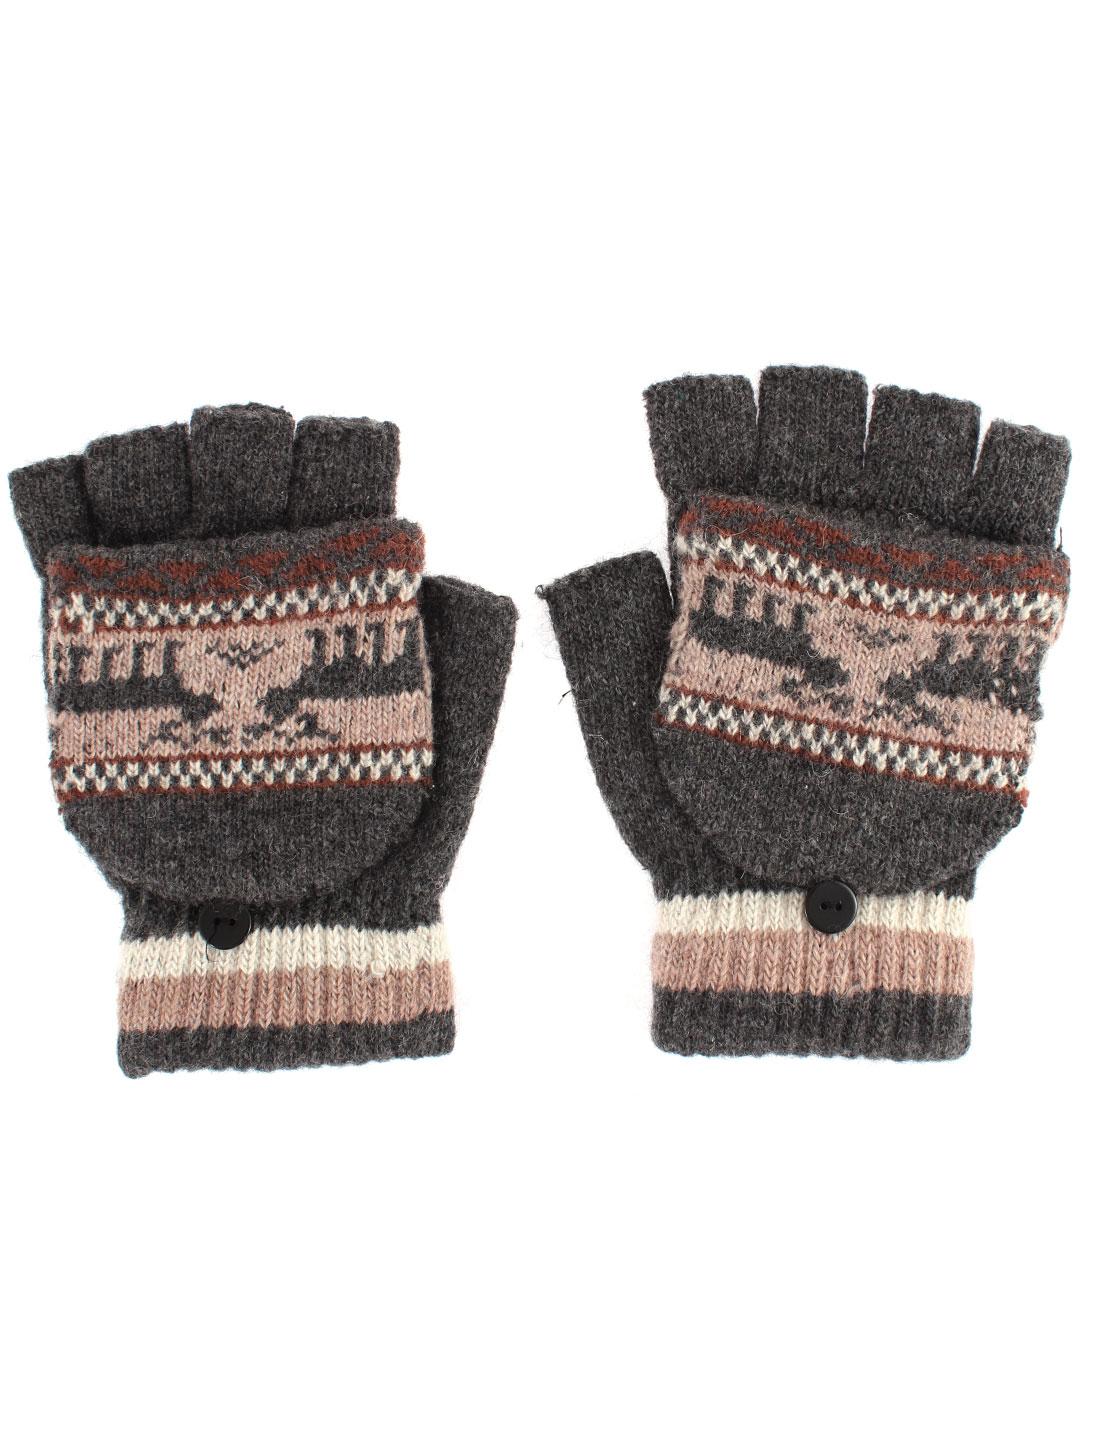 Unisex Deer Pattern Flip Convertible Half-finger Knitted Gloves Gray Pair